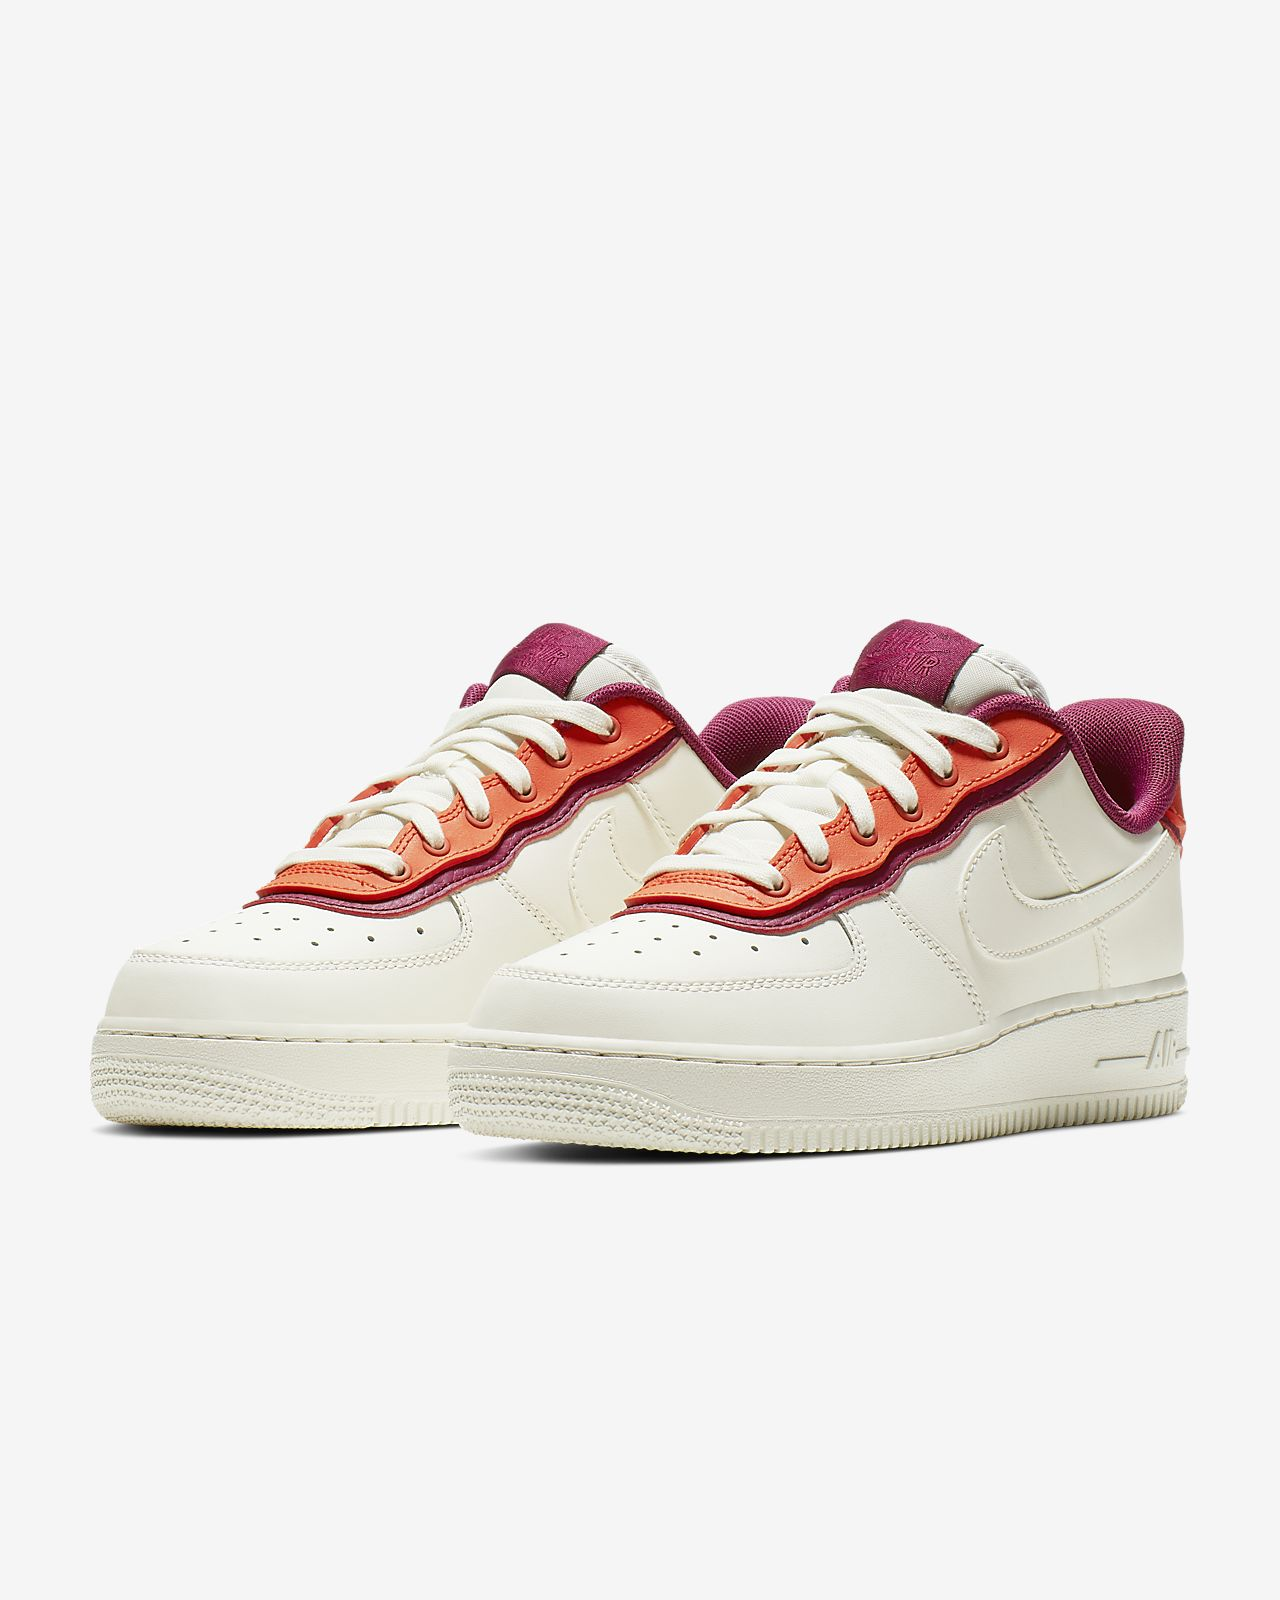 free shipping 5737f e7af8 ... Nike Air Force 1  07 SE Women s Shoe